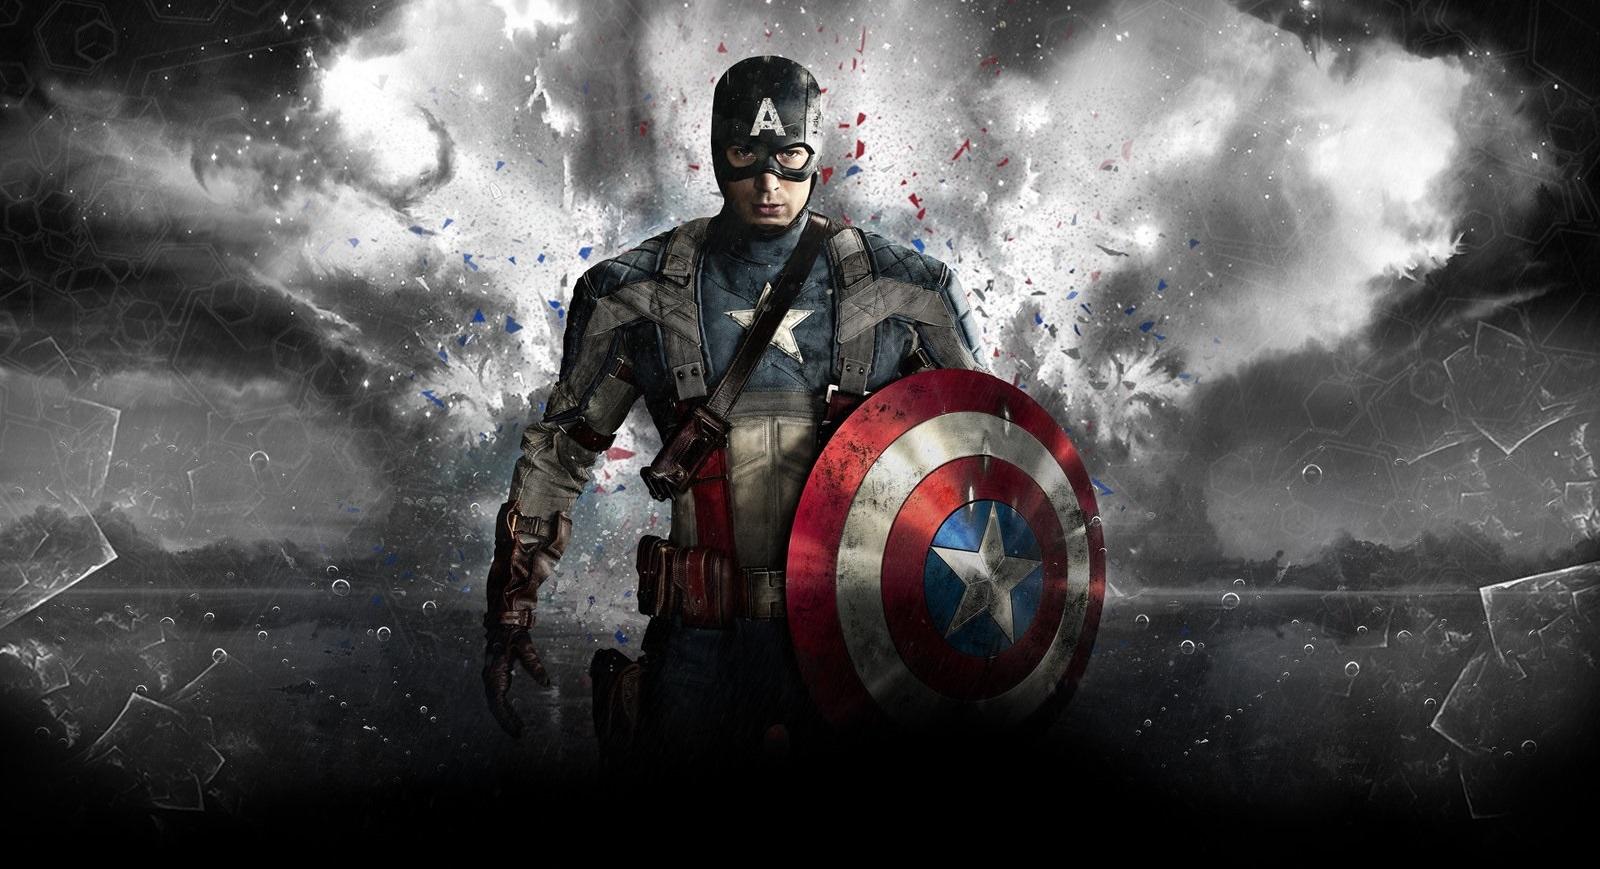 Captain America HD Wallpaper For Desktop 1600x869